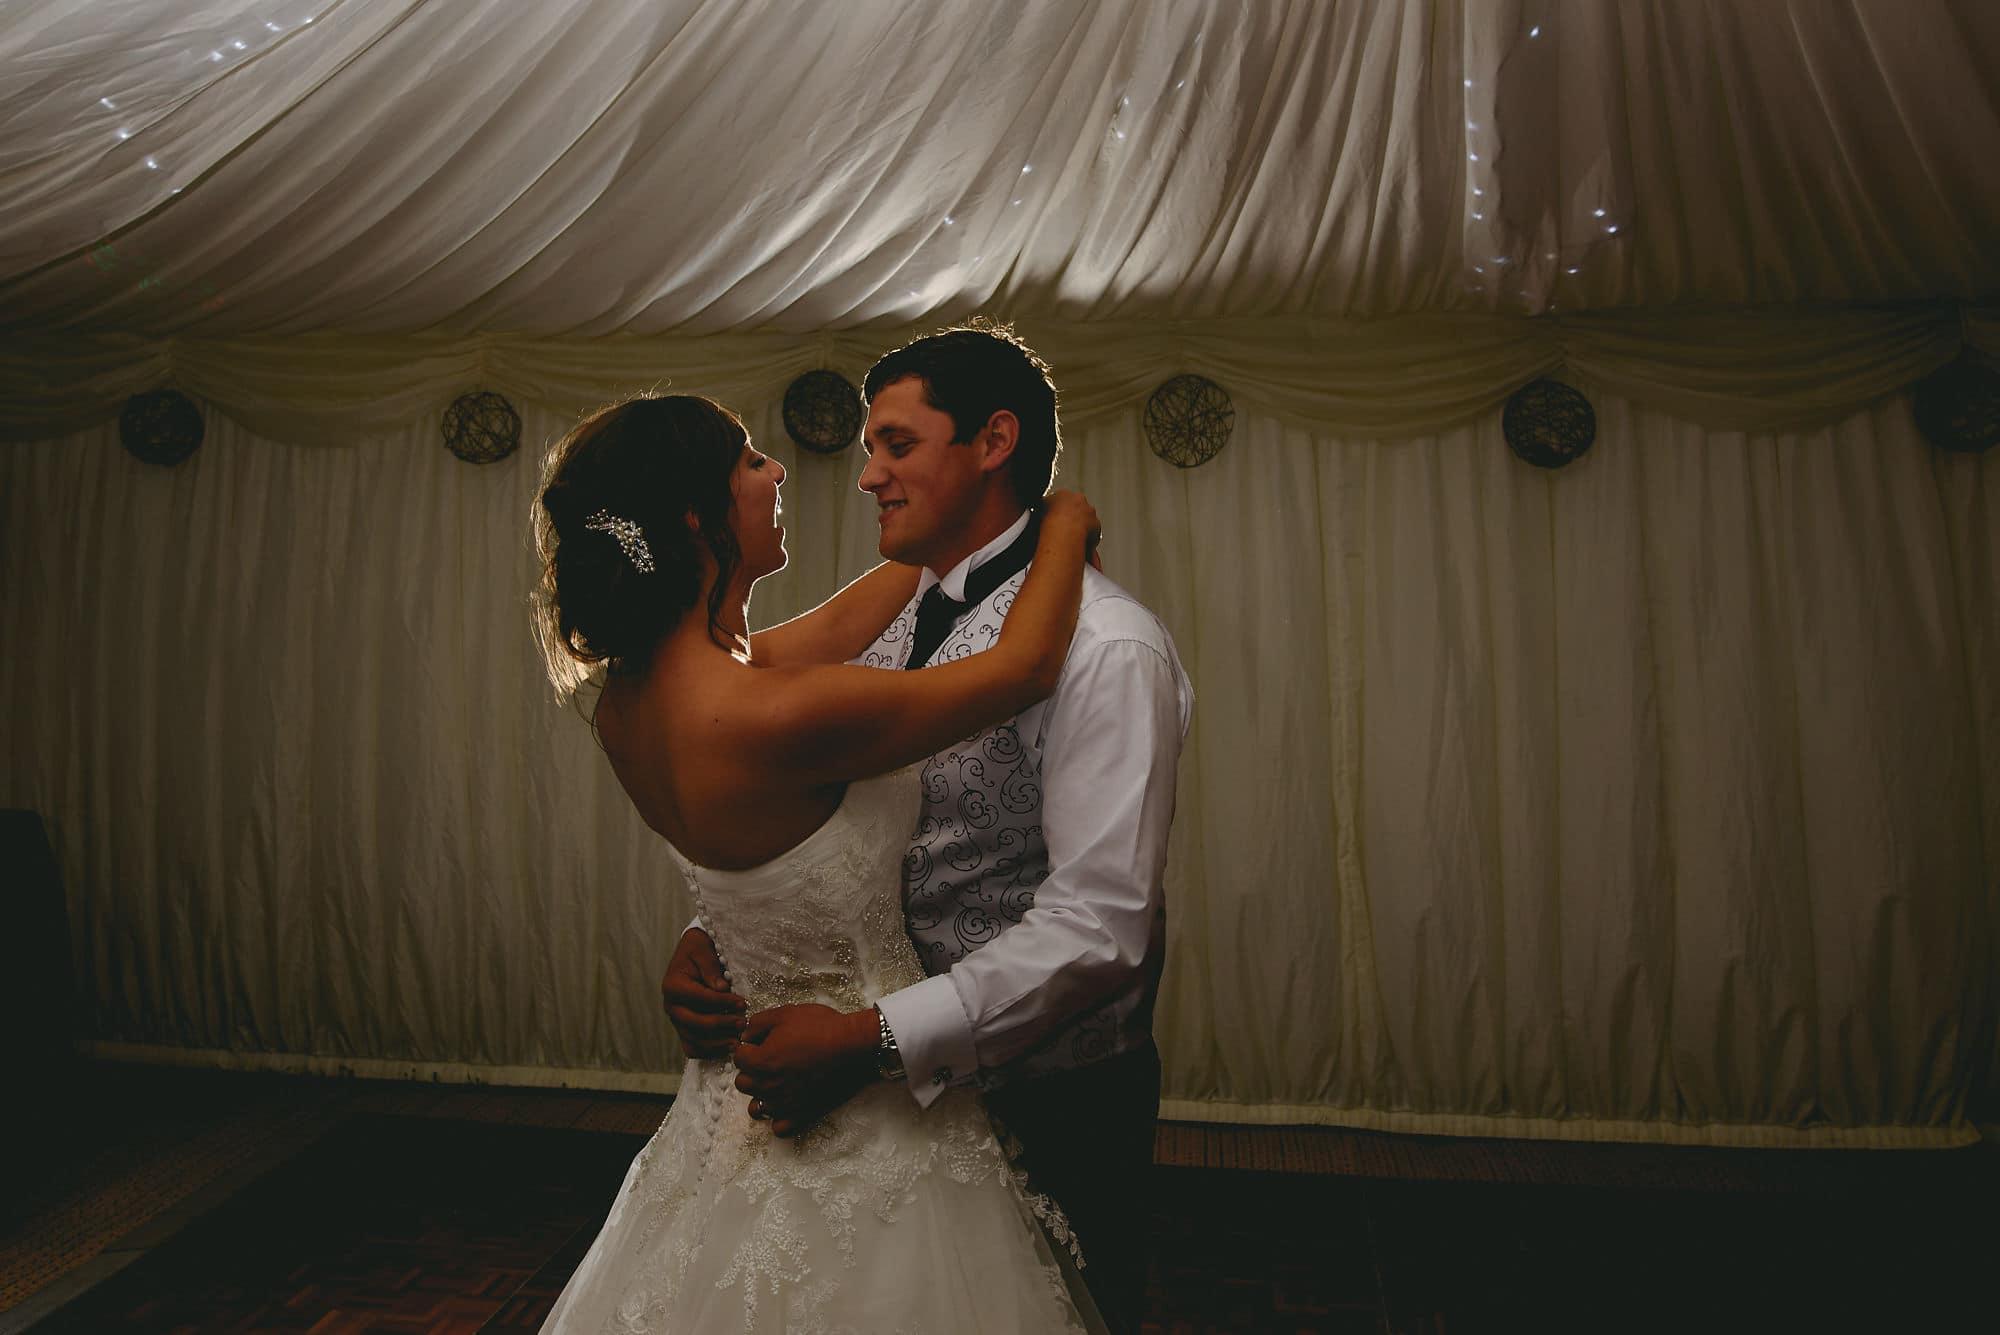 Matt & Holly's Beccles Wedding 13